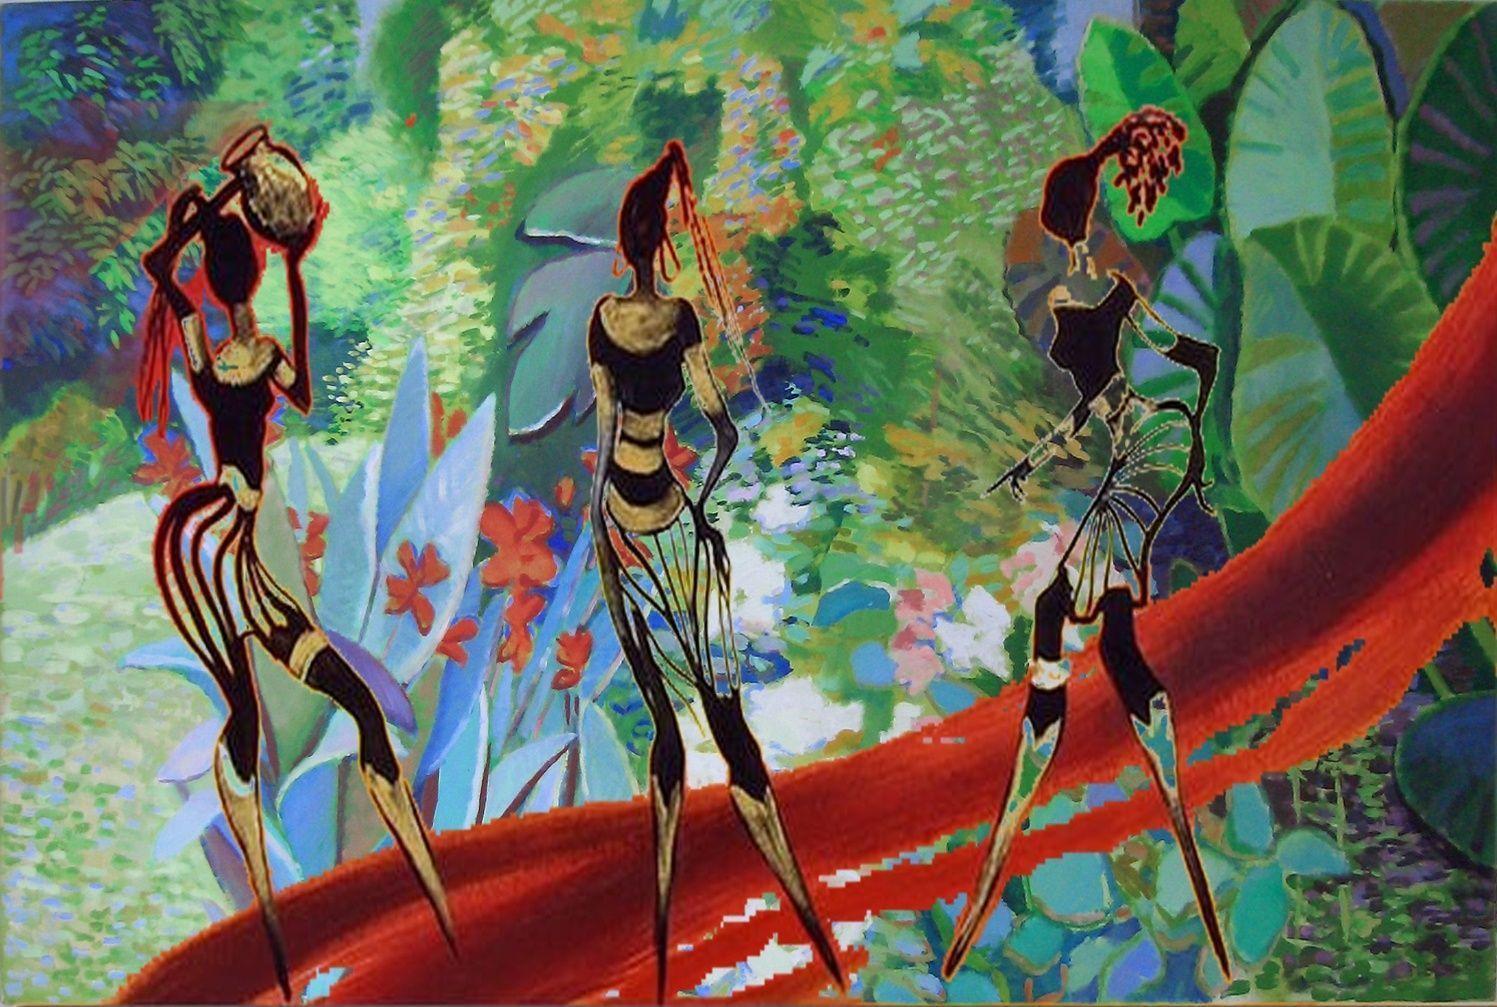 African Art Wallpapers - Wallpaper Cave